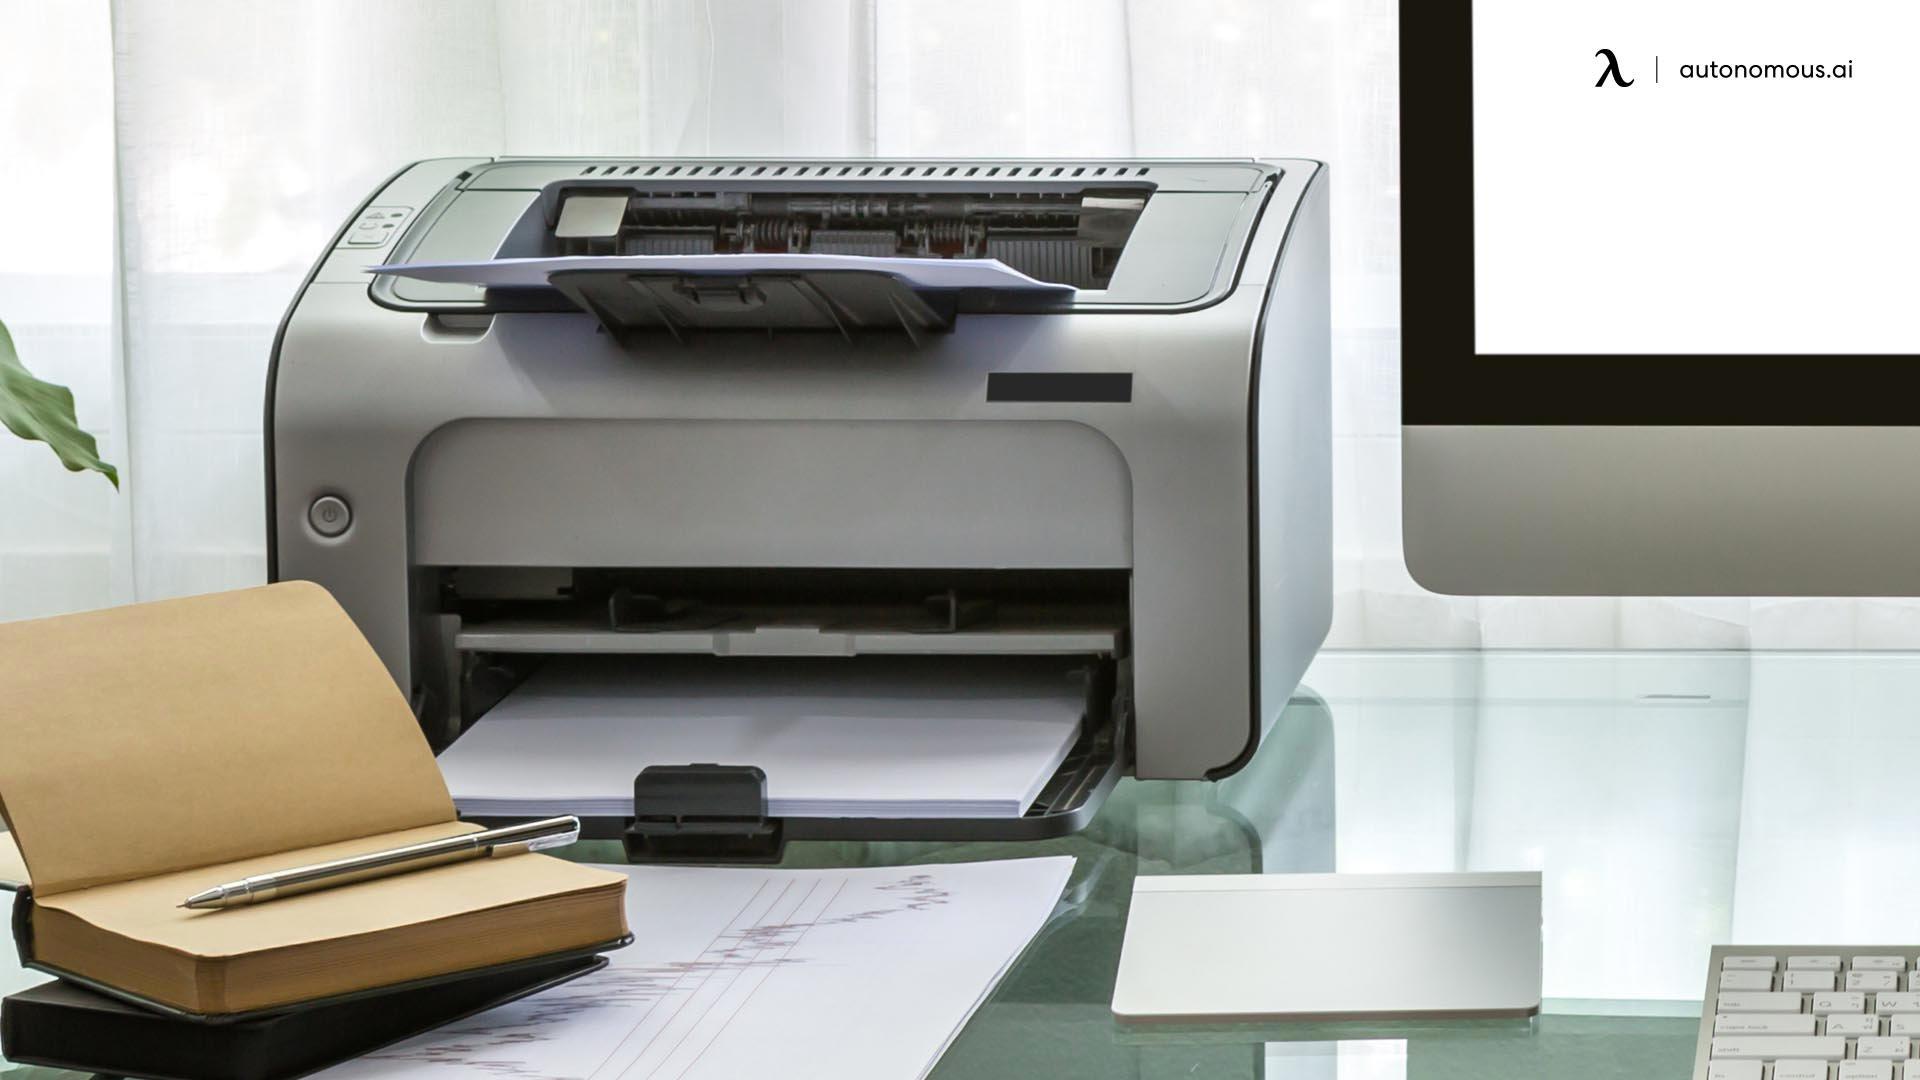 Printers for freelancers